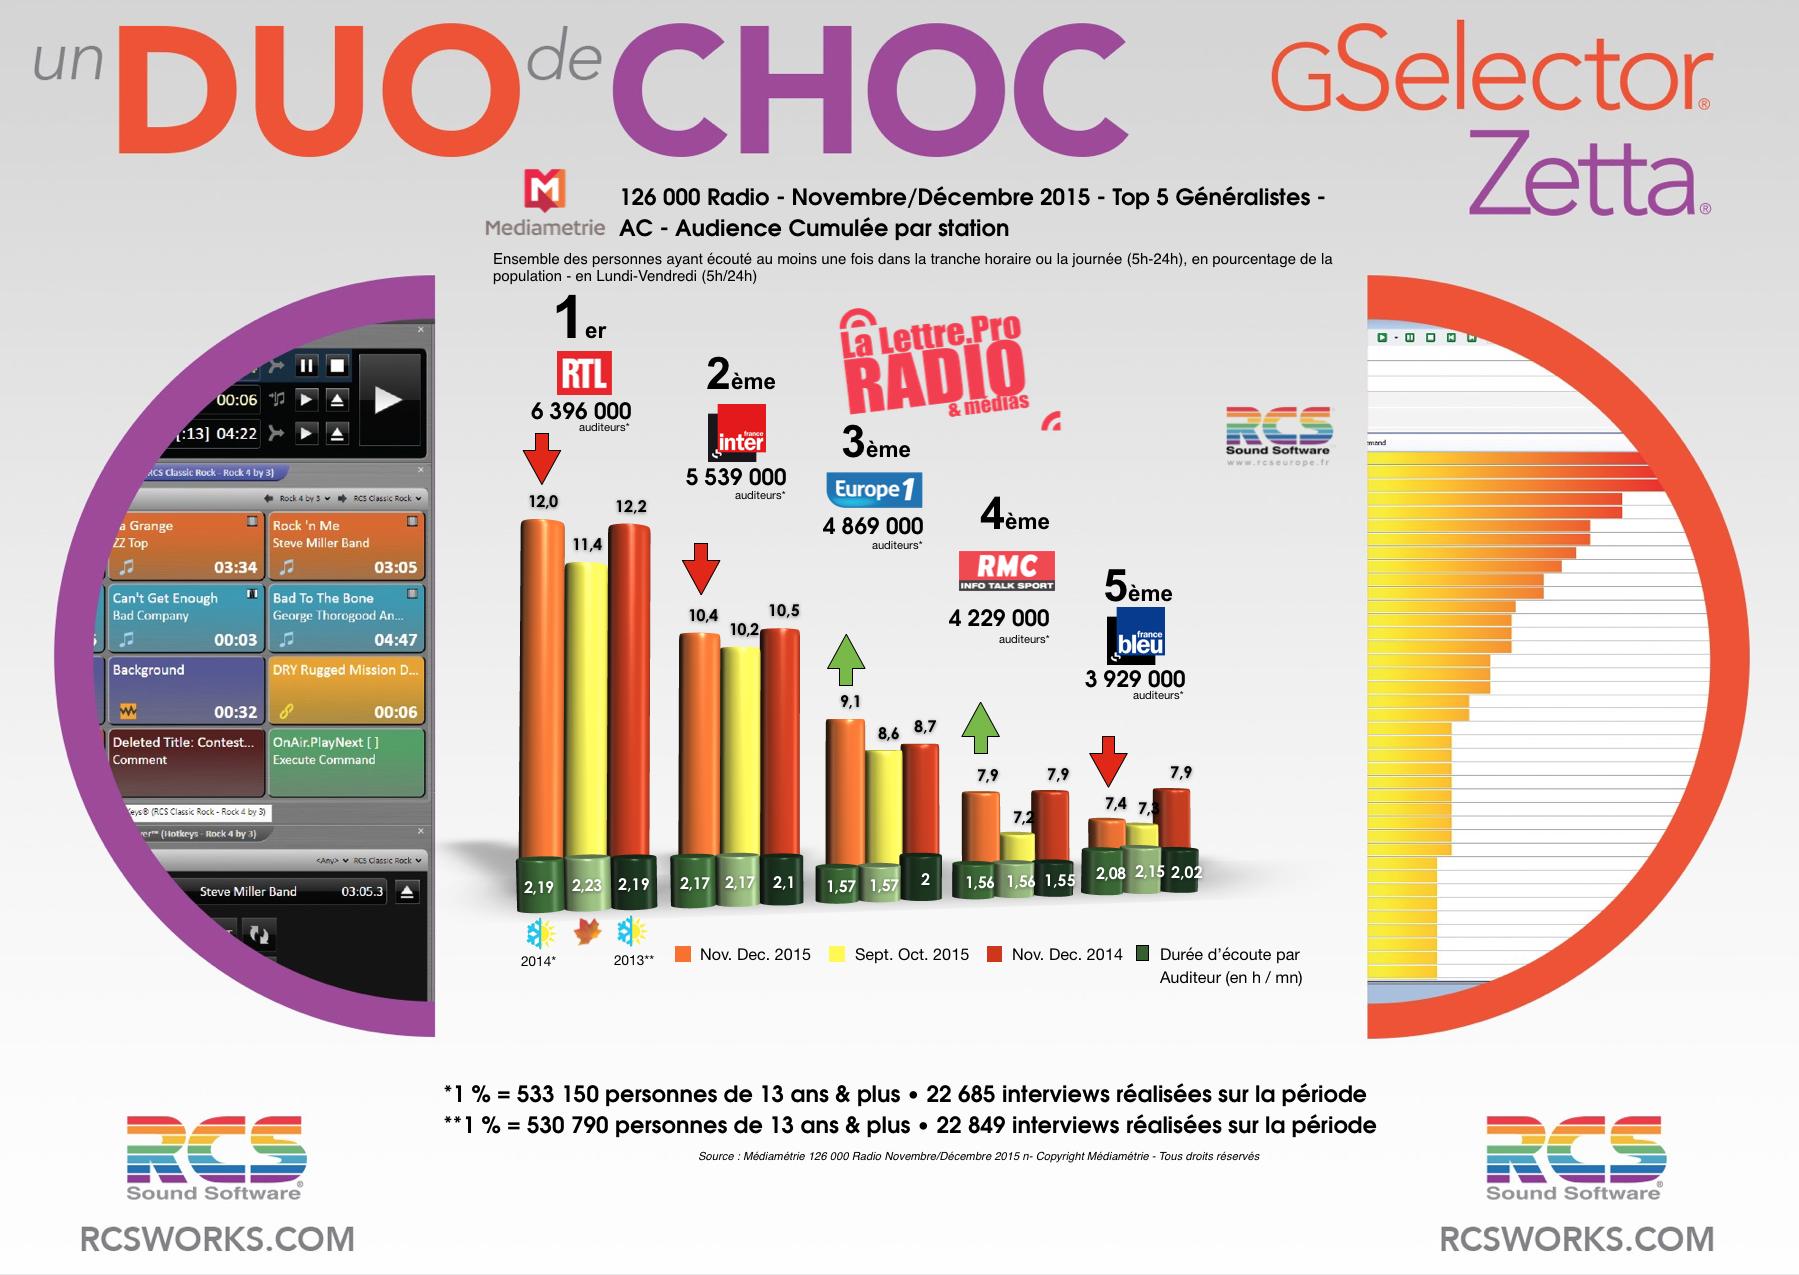 Diagramme exclusif LLP/RCS GSelector 4 - TOP 5 radios Généralistes en Lundi-Vendredi - 126 000 Radio Novembre-Décembre 2015